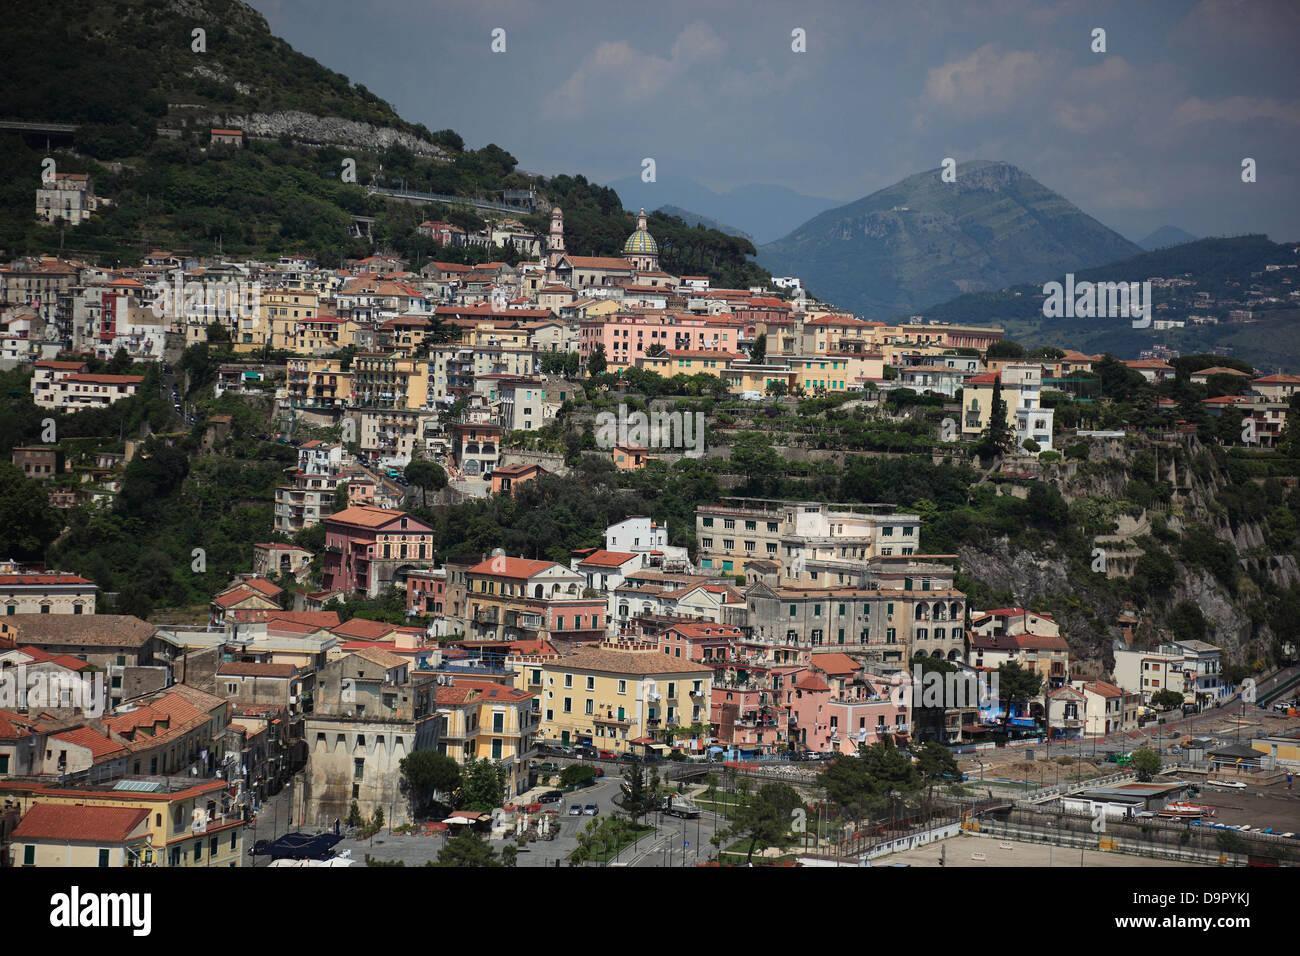 Vietri sul Mare, Campania, Italy, on the Amalfi Coast, Campania, Italy Stock Photo